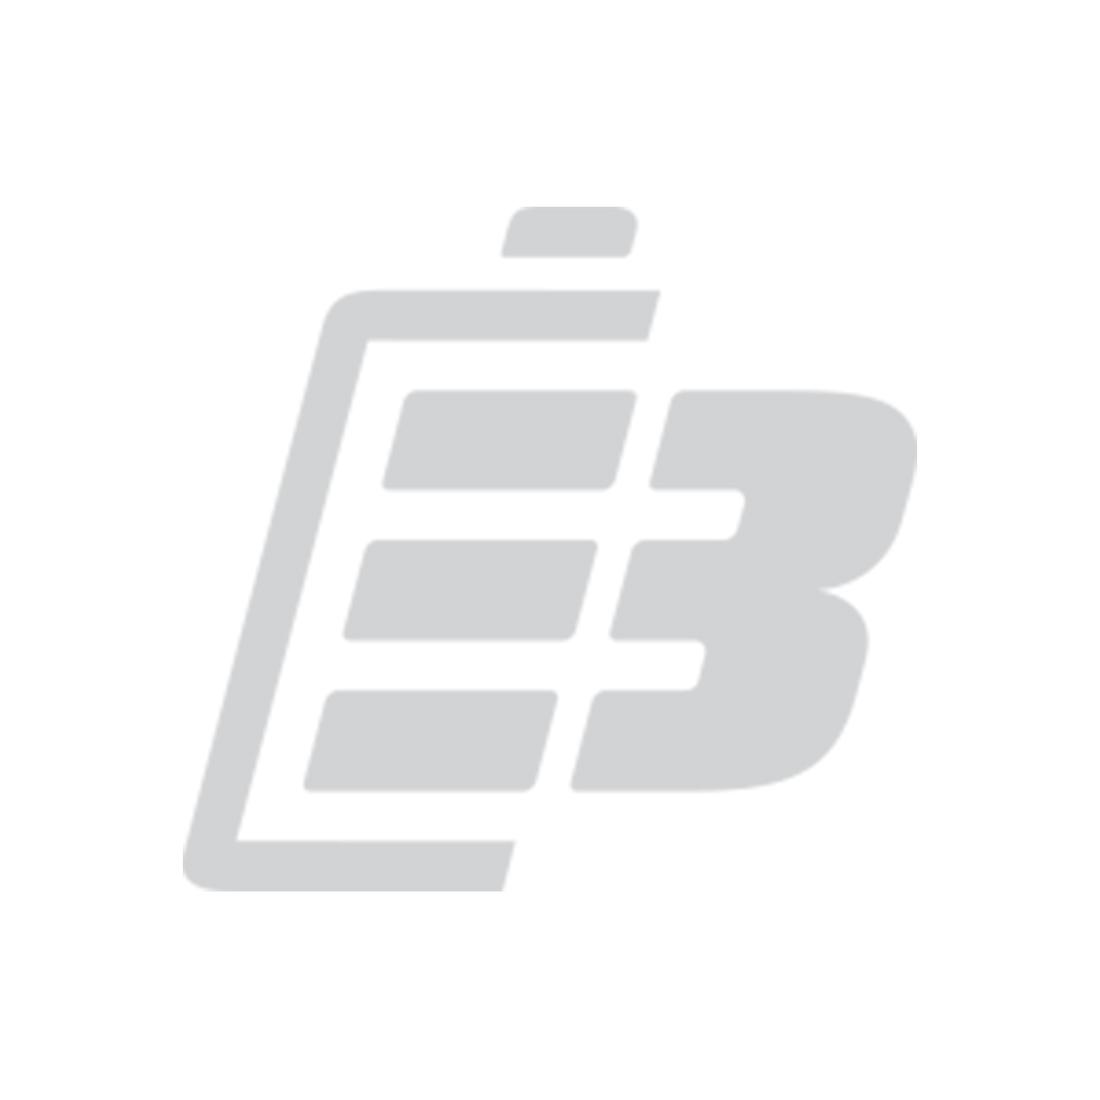 power tool battery bosch 12v 3 0ah. Black Bedroom Furniture Sets. Home Design Ideas